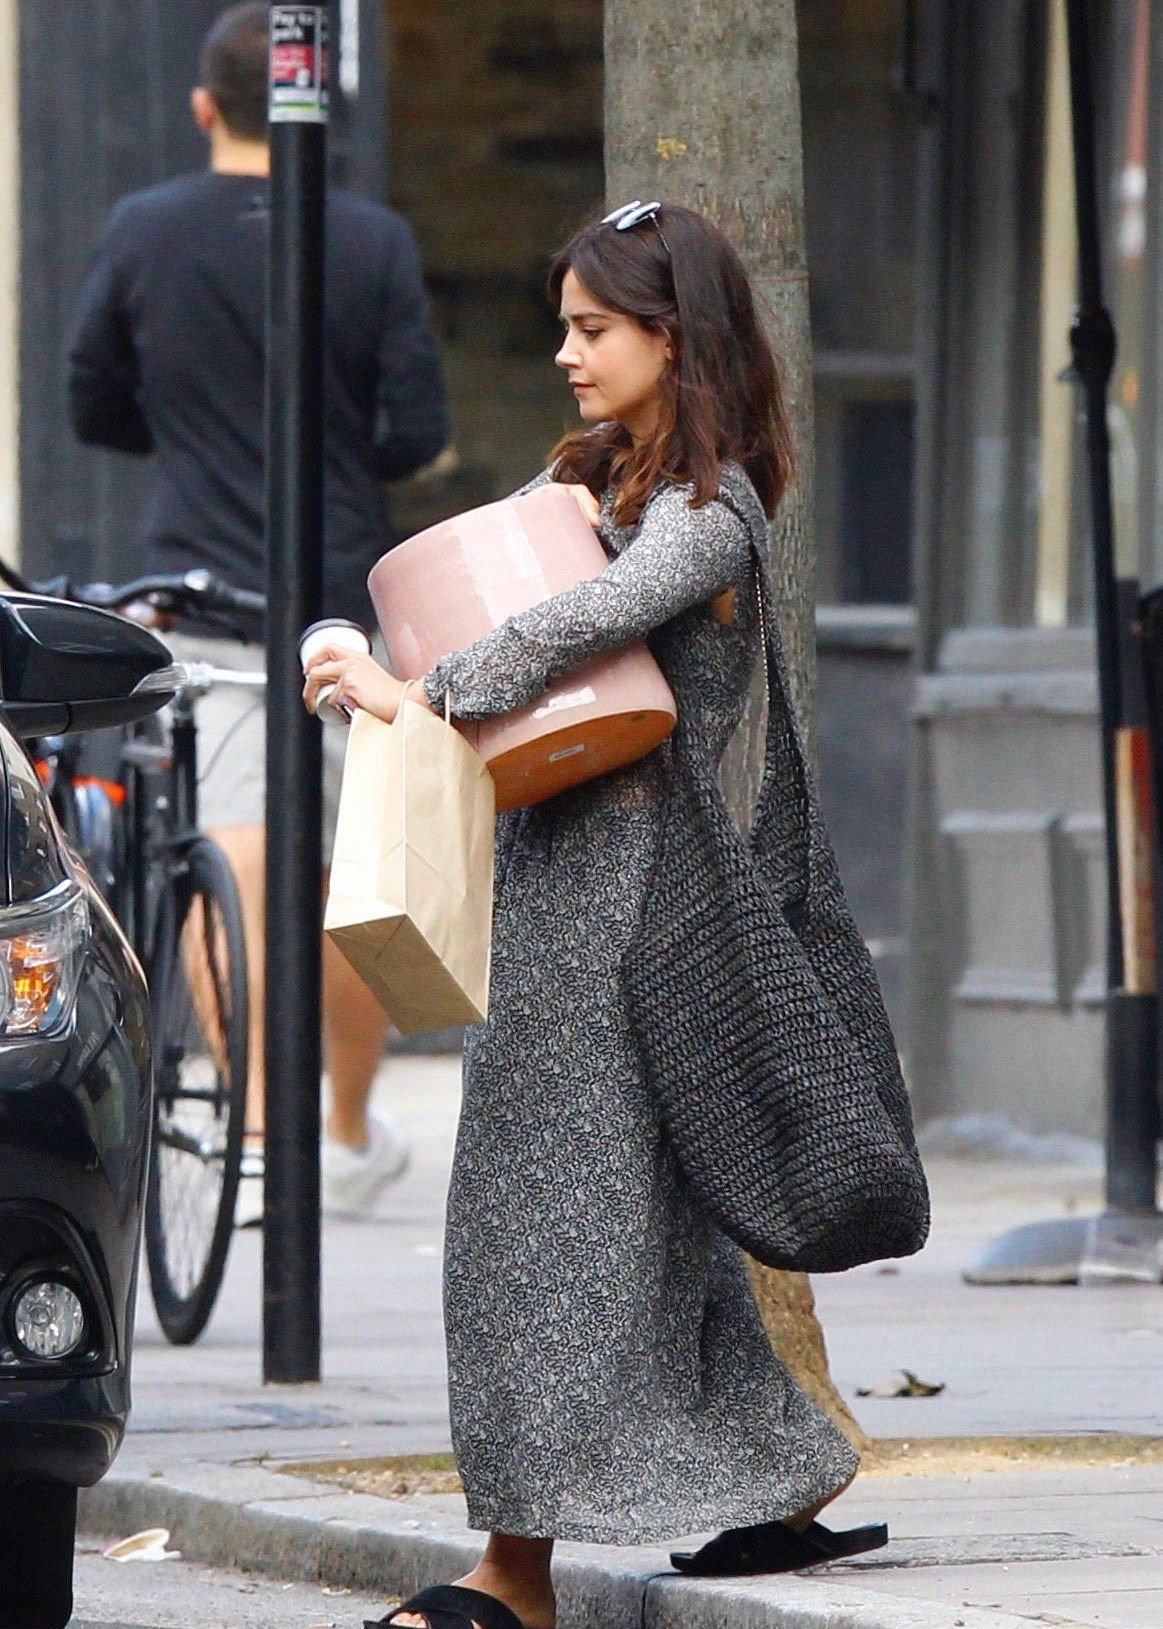 Jenna Coleman伦敦购物新街拍,刚迁新居的她买了一个好大的花瓶